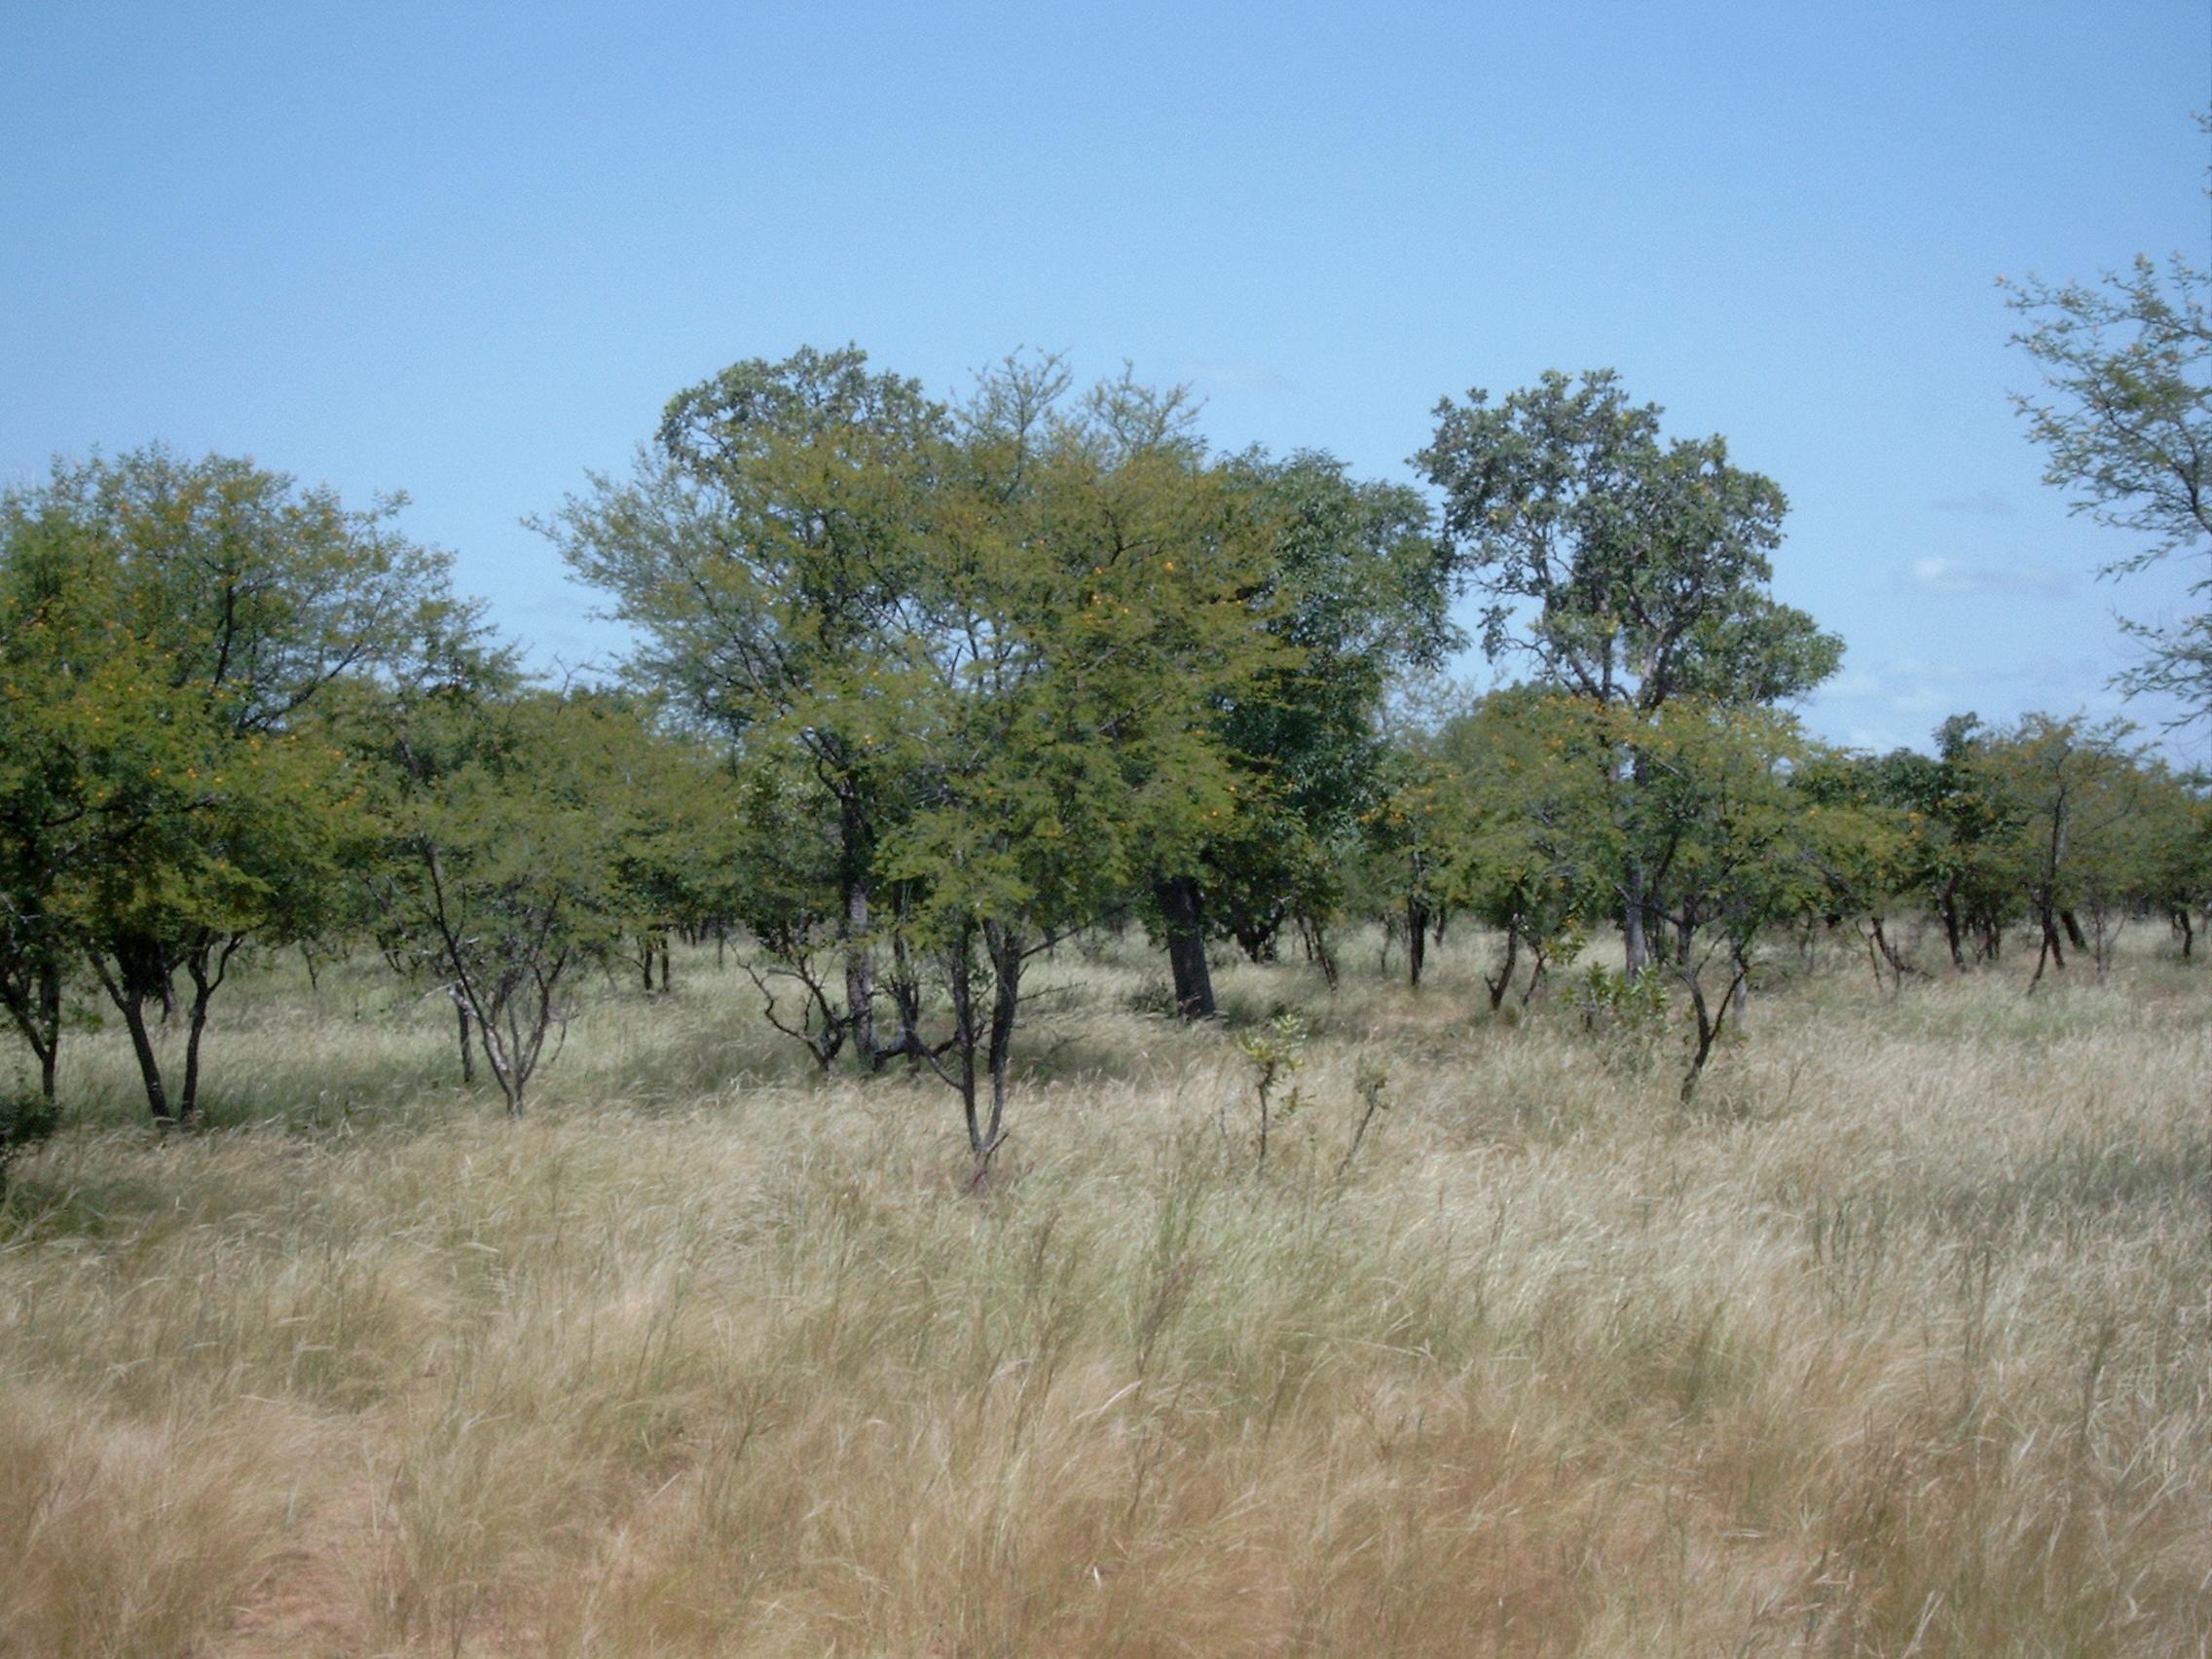 Acacia Bild1086.jpg